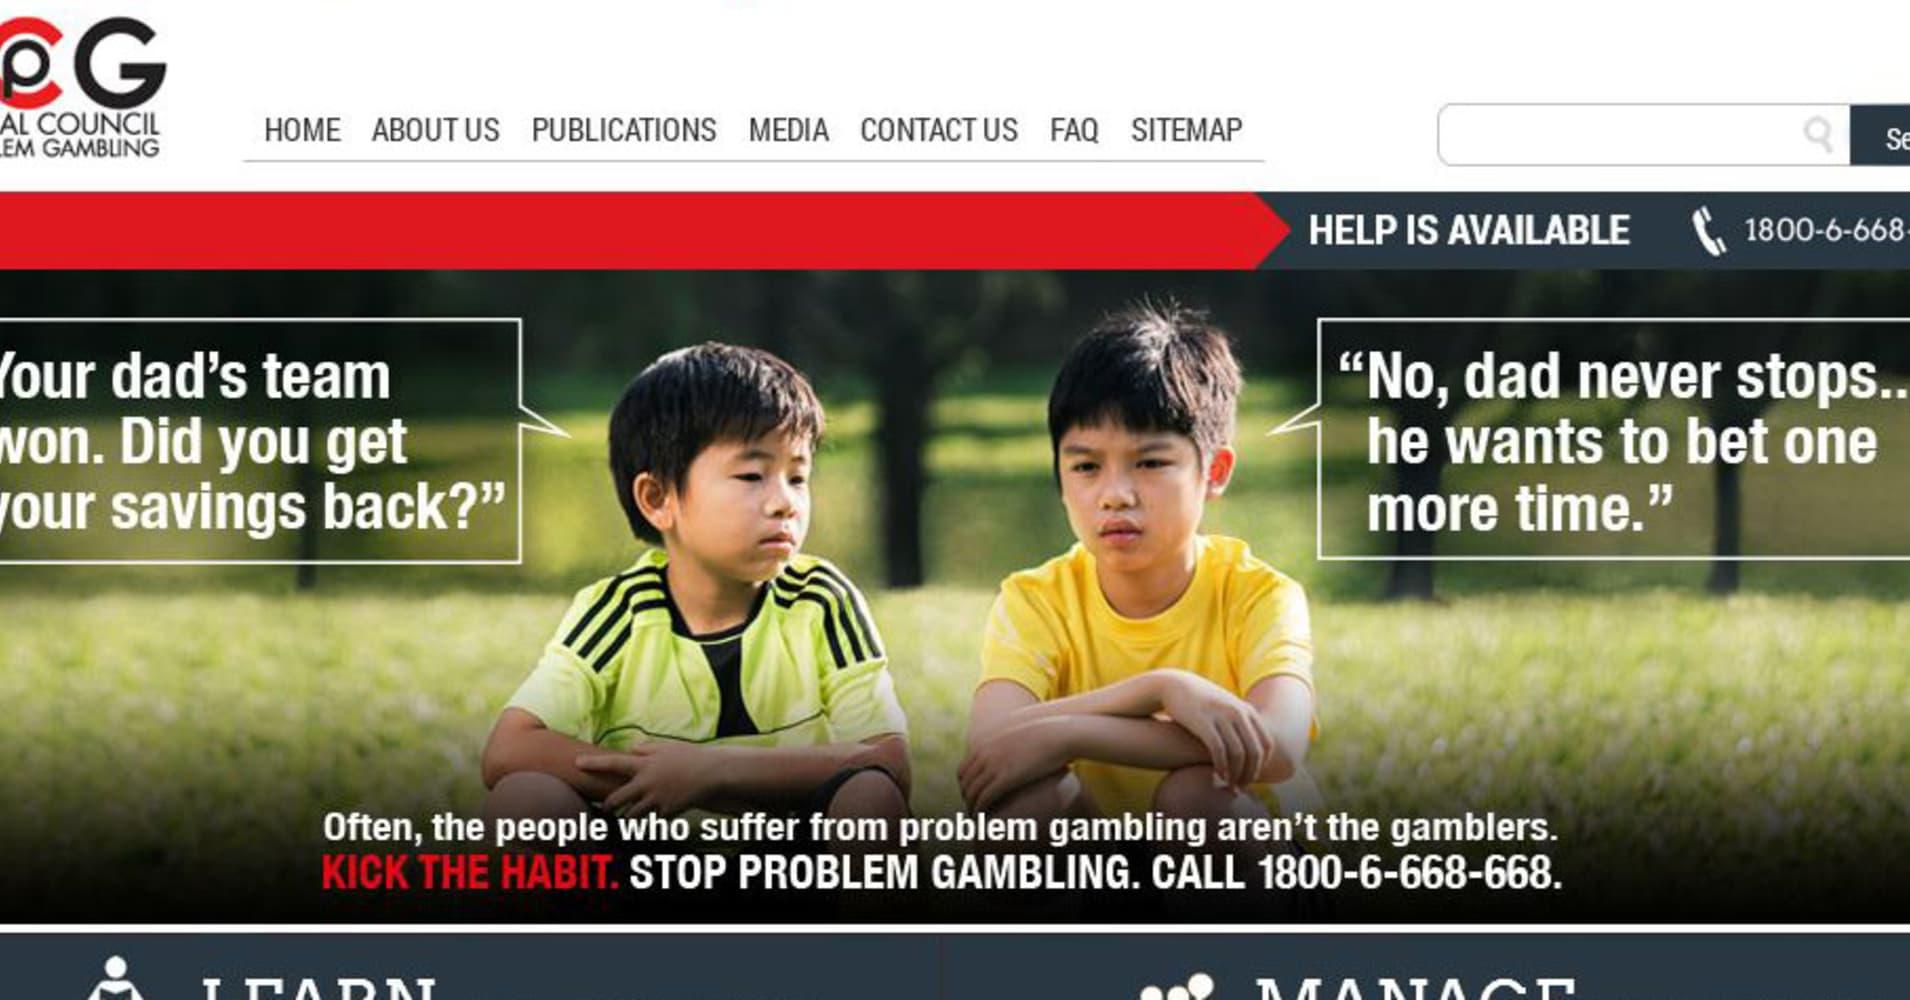 Netherlands gambling authority